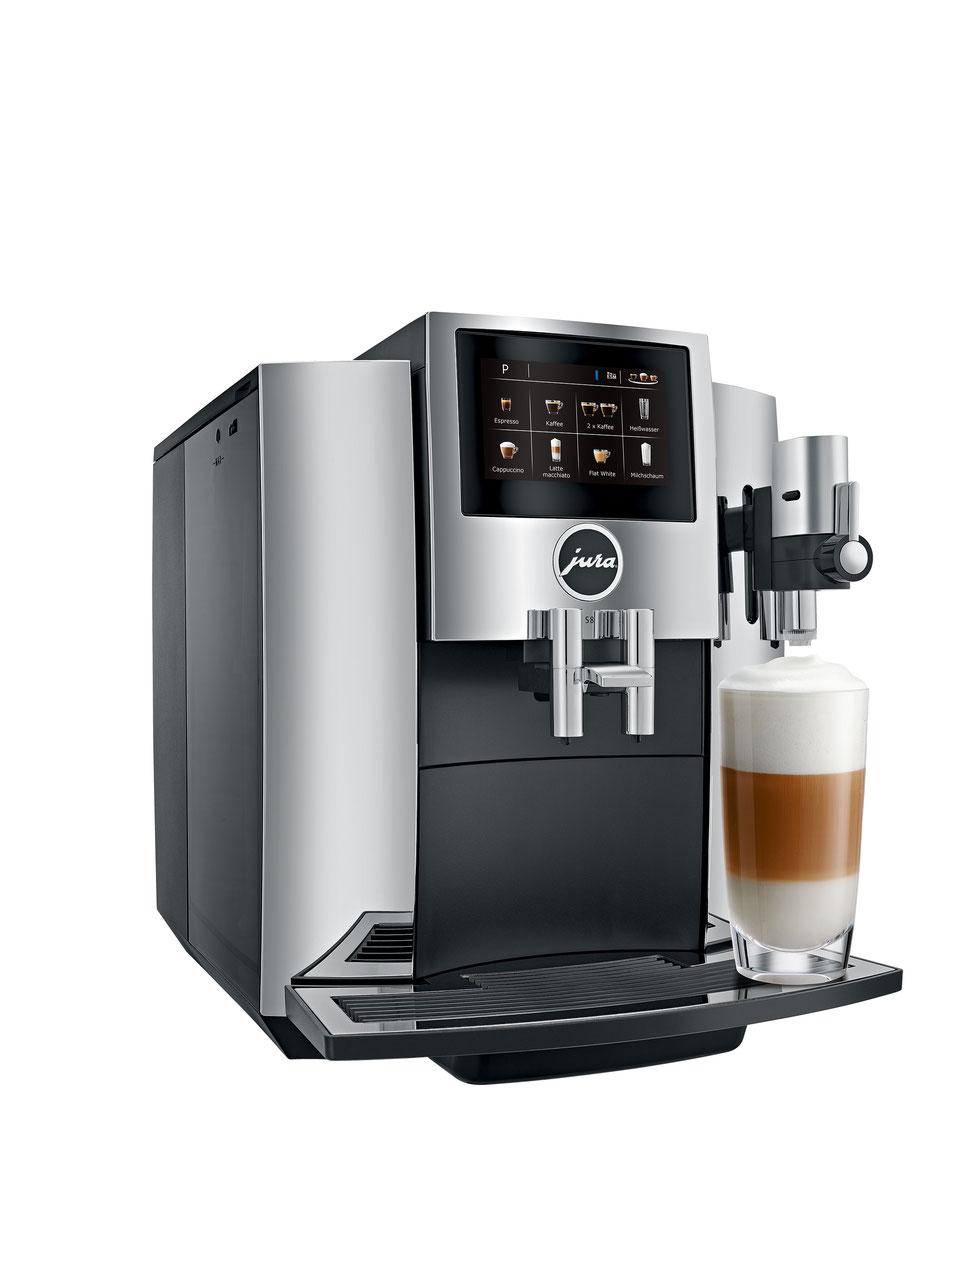 jura s8 chrom ch service point kaffeemaschinen. Black Bedroom Furniture Sets. Home Design Ideas